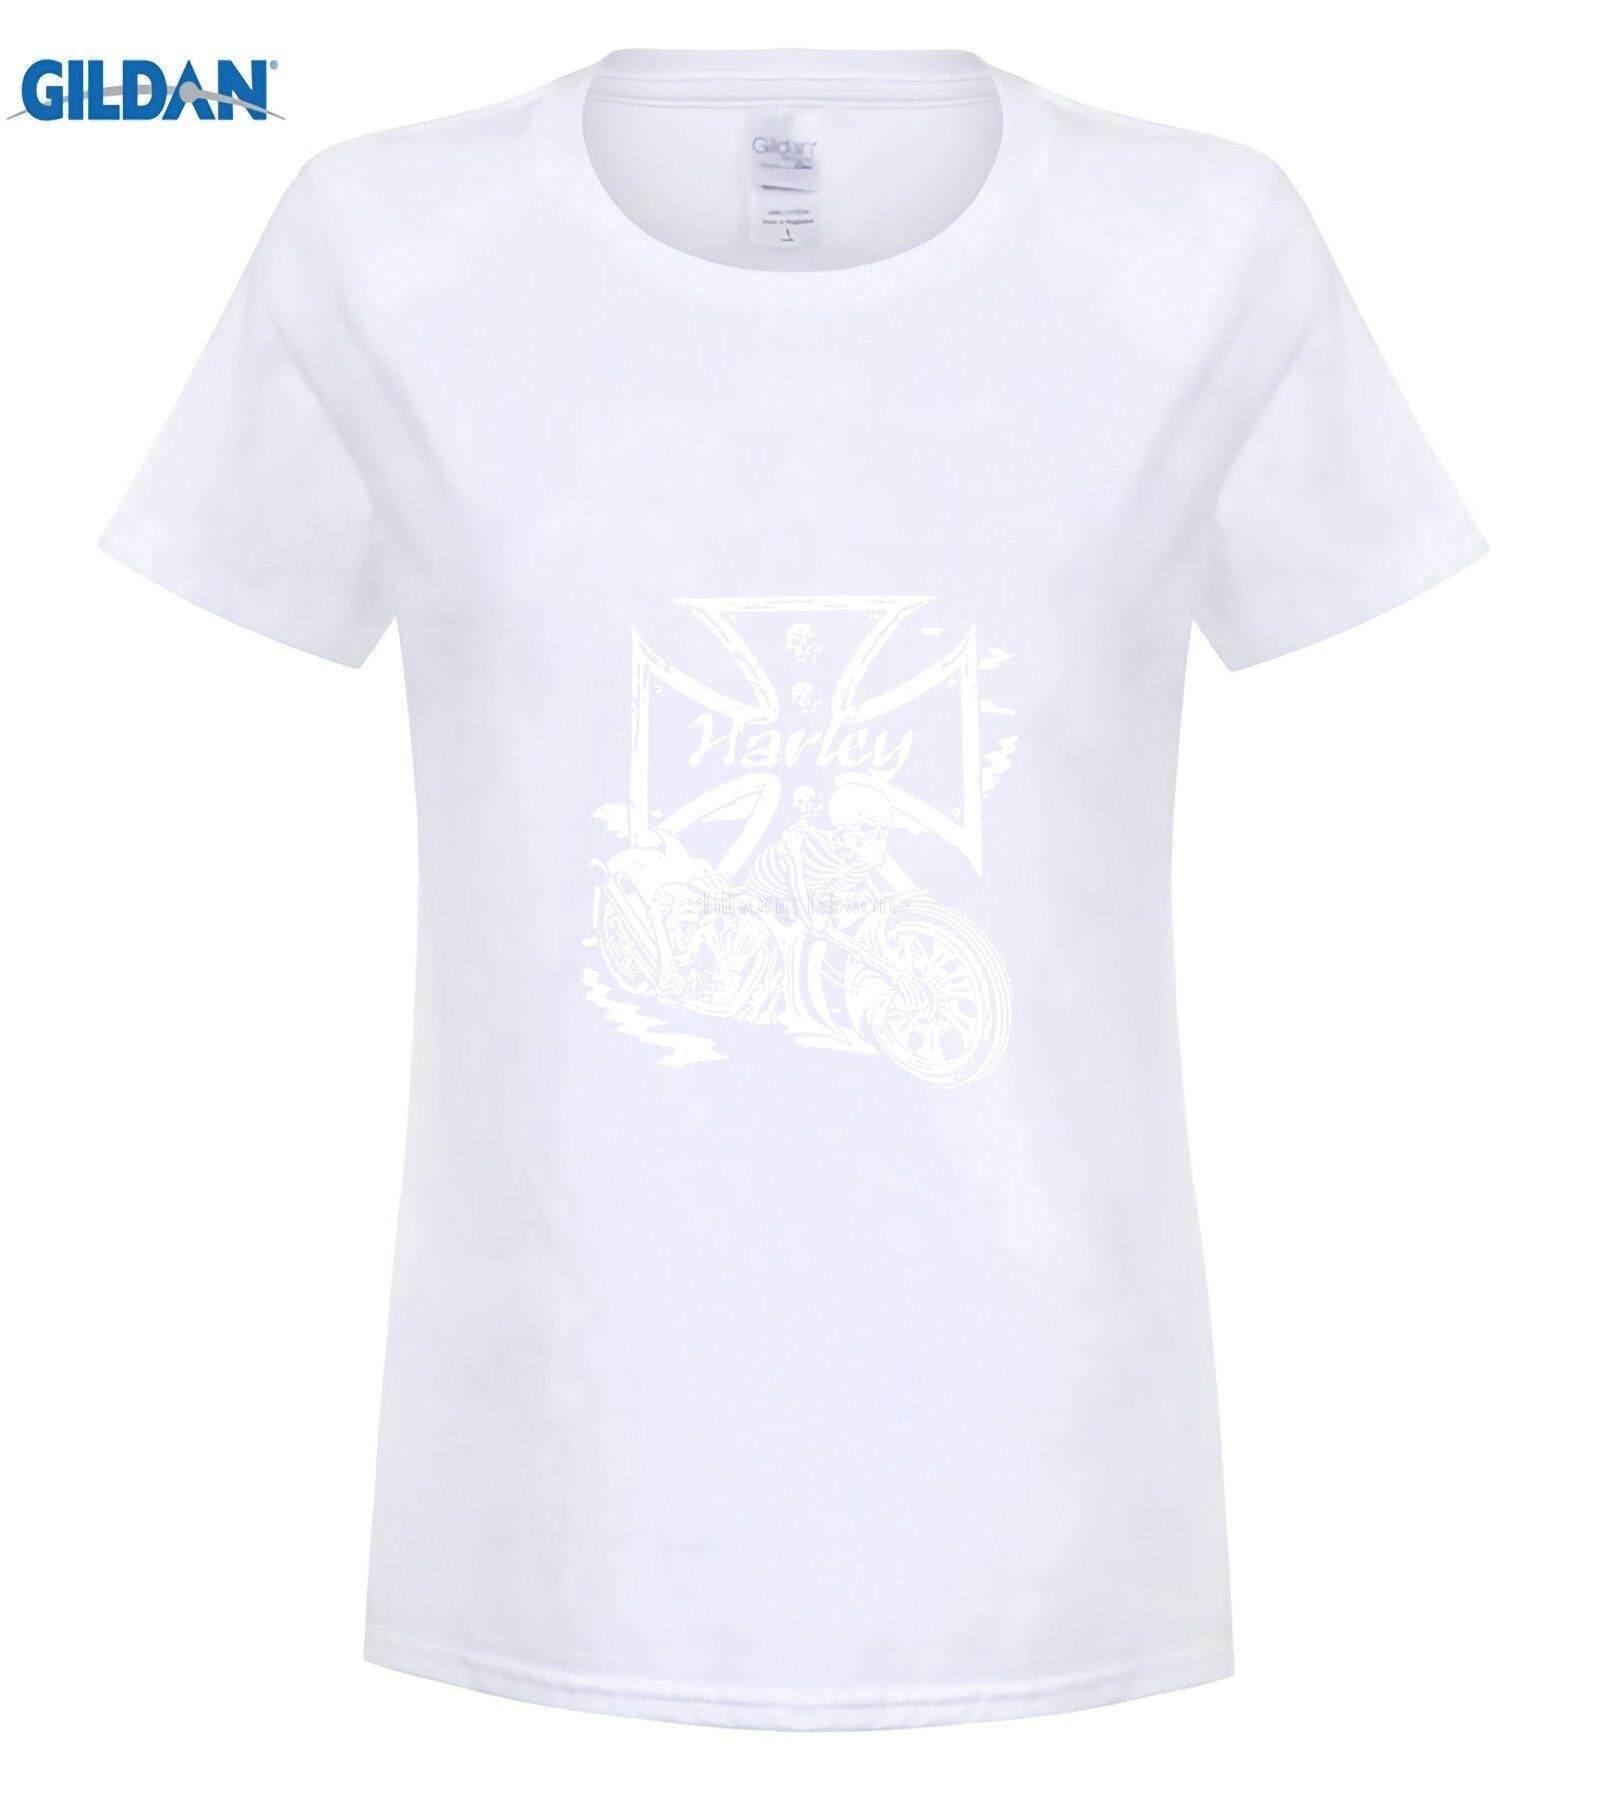 2c6c1d3a FK 2019 Hot sale 100% cotton Mens T Shirts Fashion 2019 High Quality Tops  Hipster